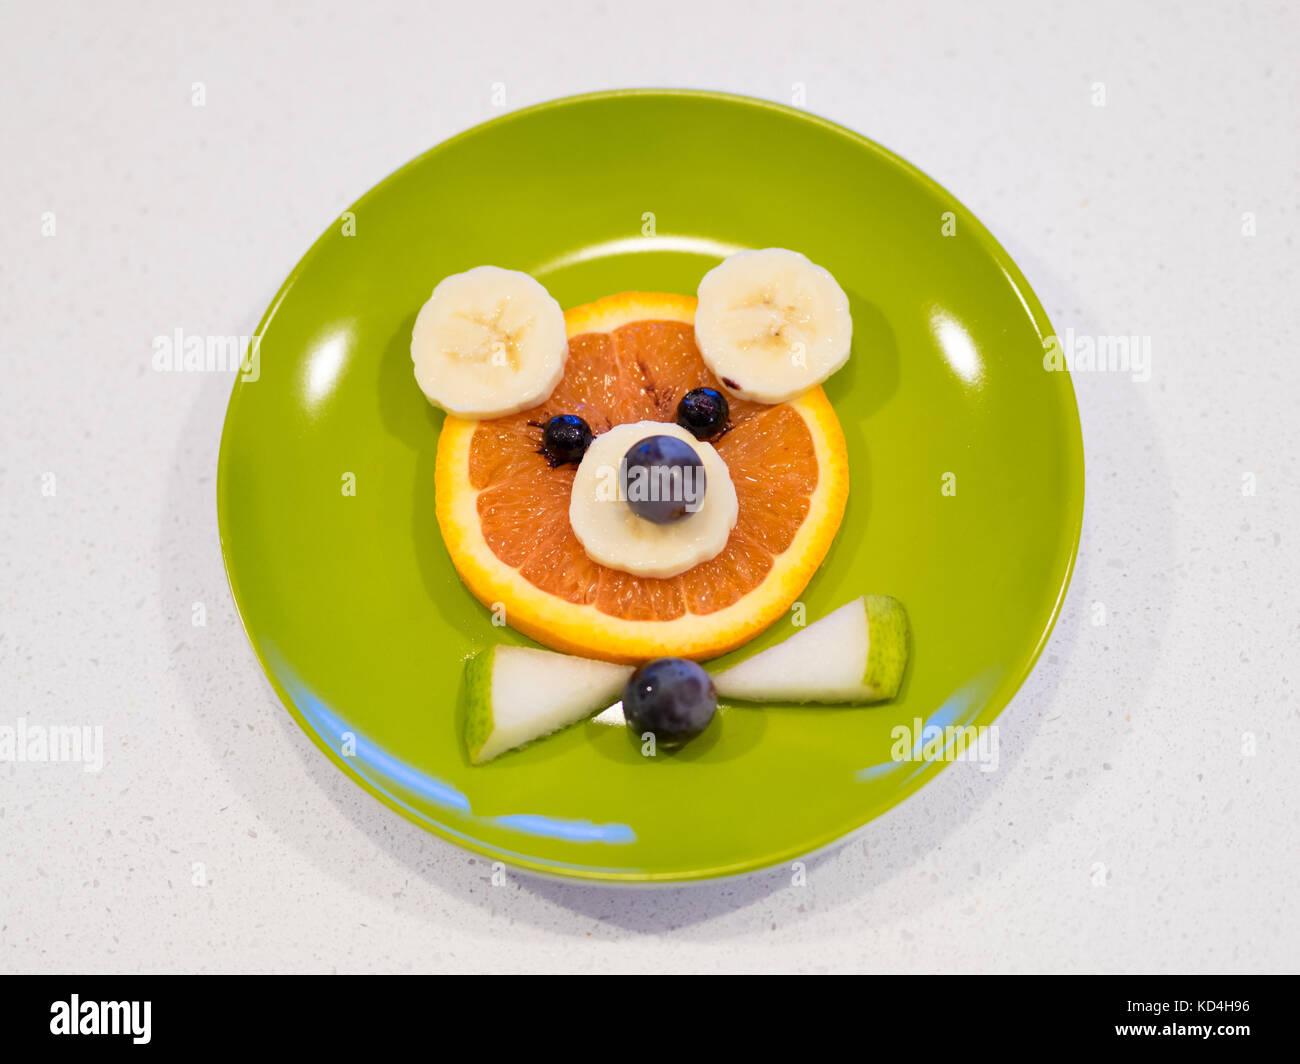 Bear Food Art For Kids Food Art Fruit Bear Made From Orange Stock Photo Alamy